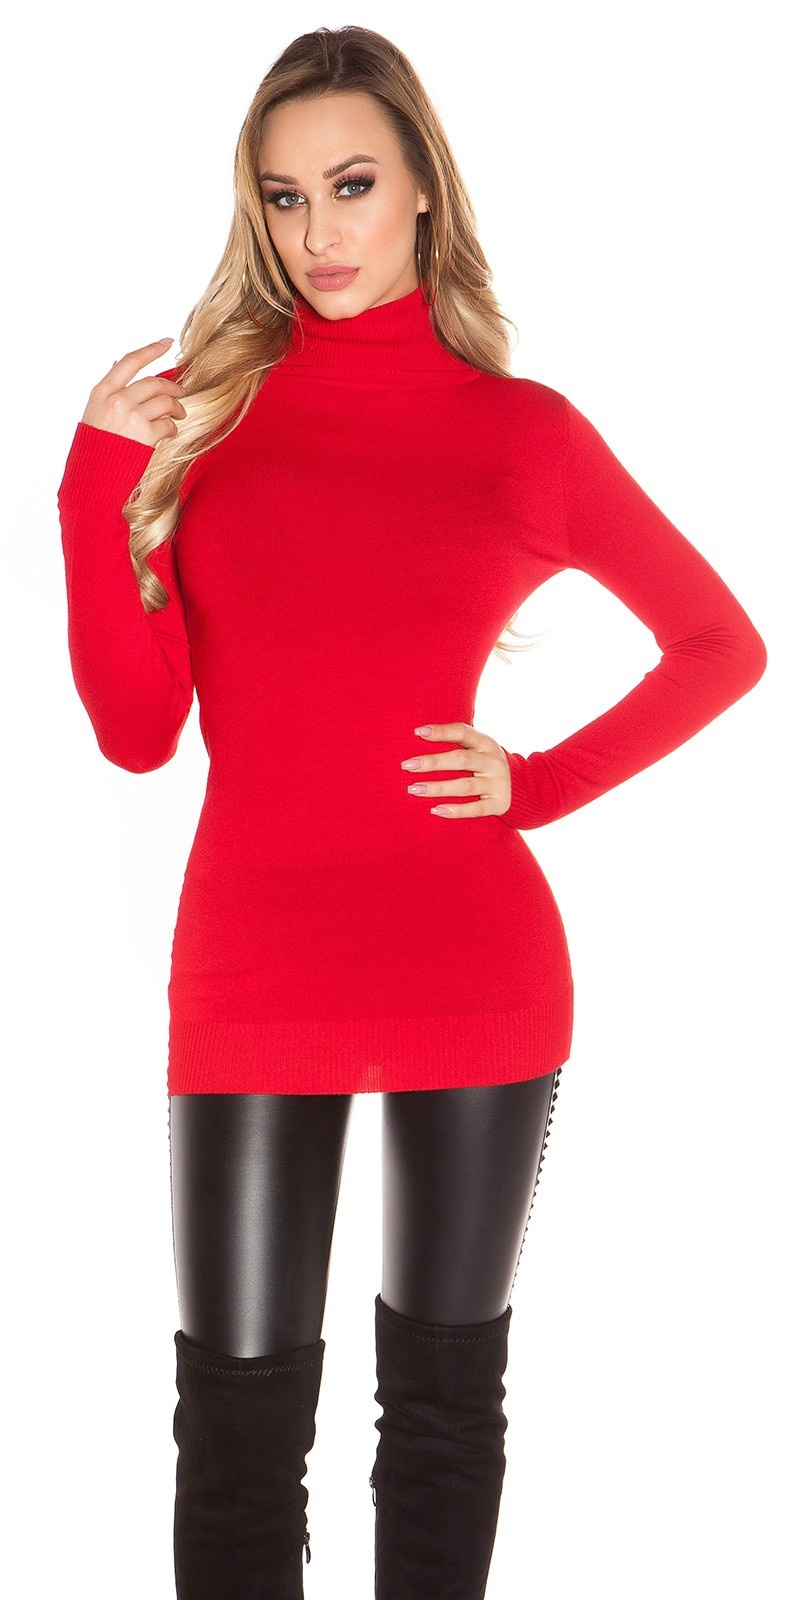 Sexy col lange sweater-trui rood